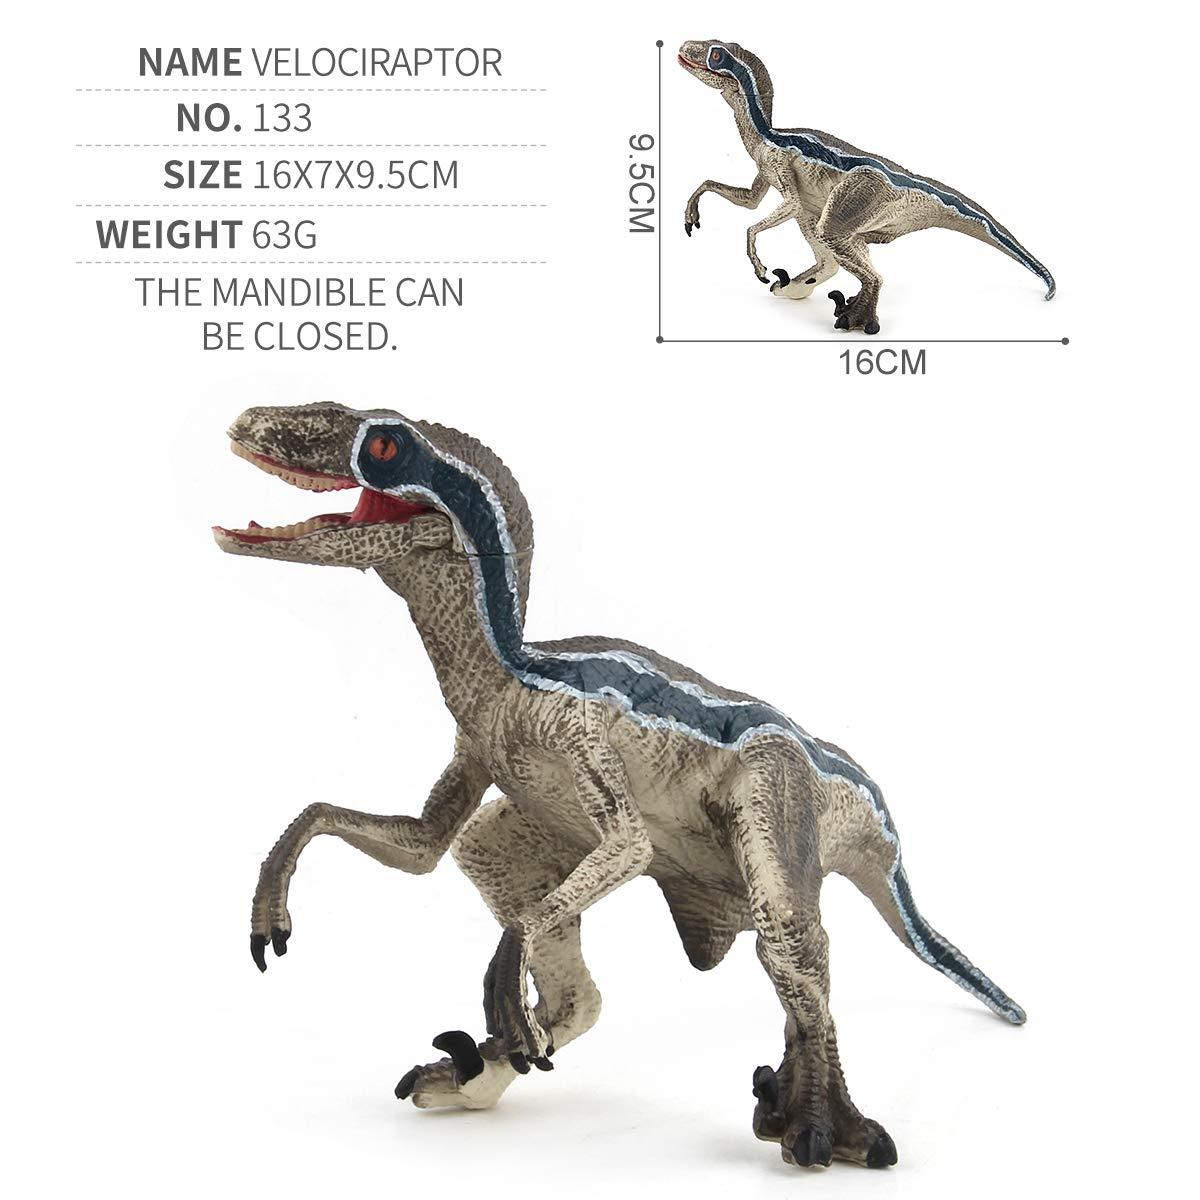 CEKtoys Velociraptor Model Toy Dinosaur Toy Jurassic Animal Model Hand-Painted Animal Models Realistic Dinosaur Models